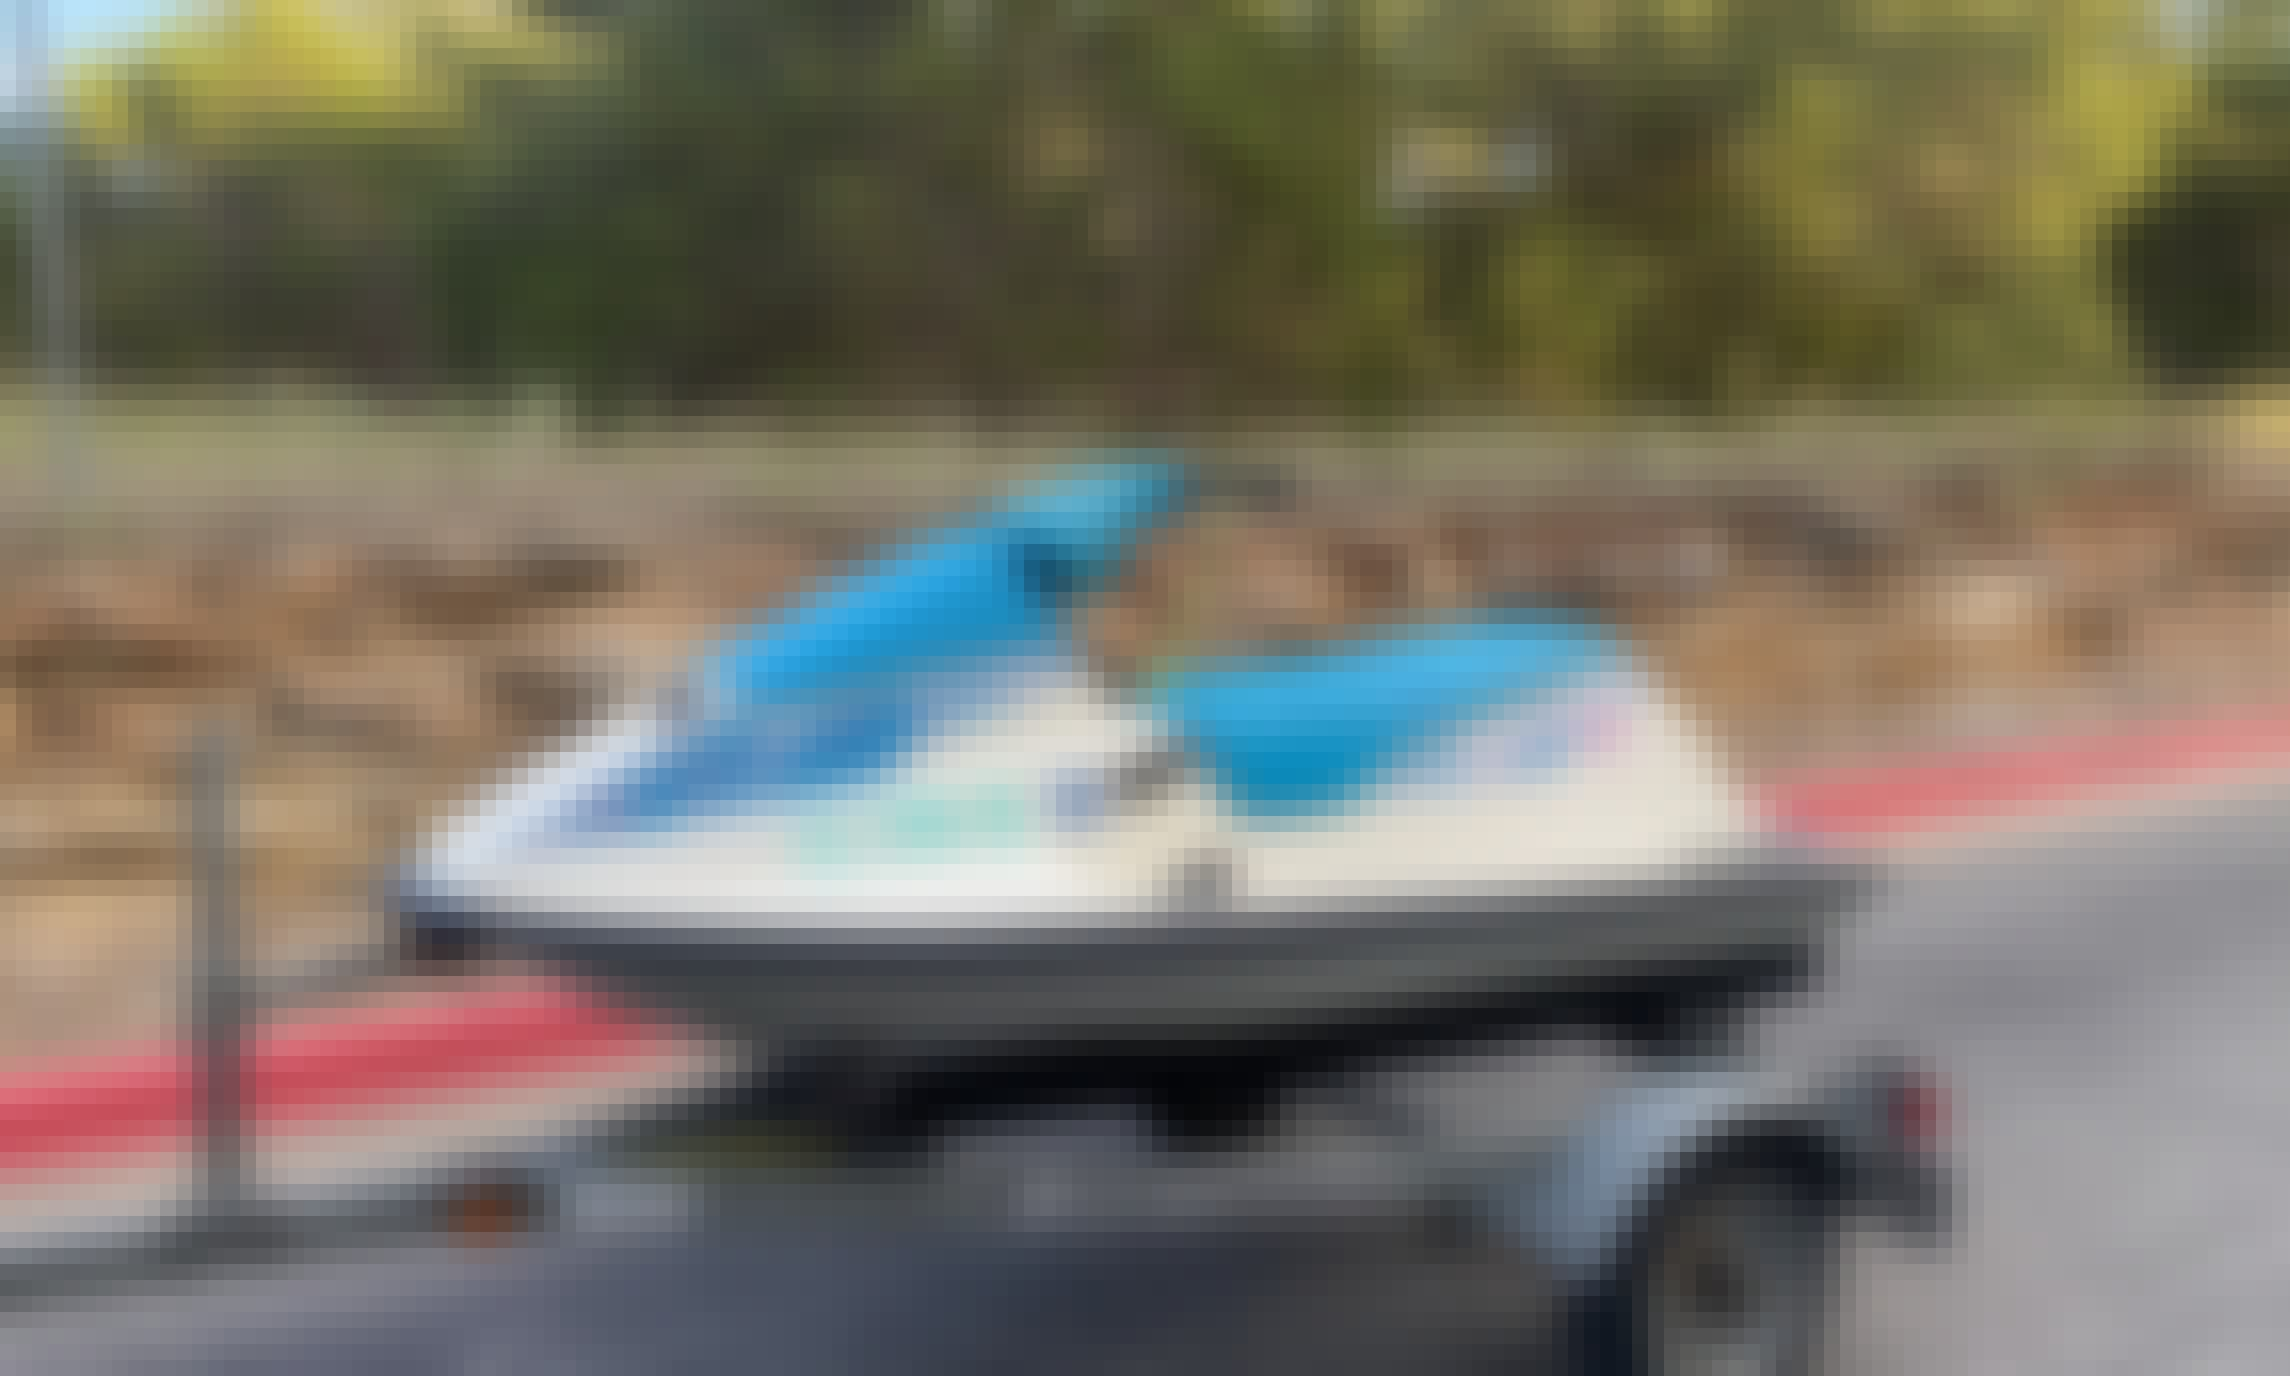 Ride a Seadoo Jetski on Lake Austin!